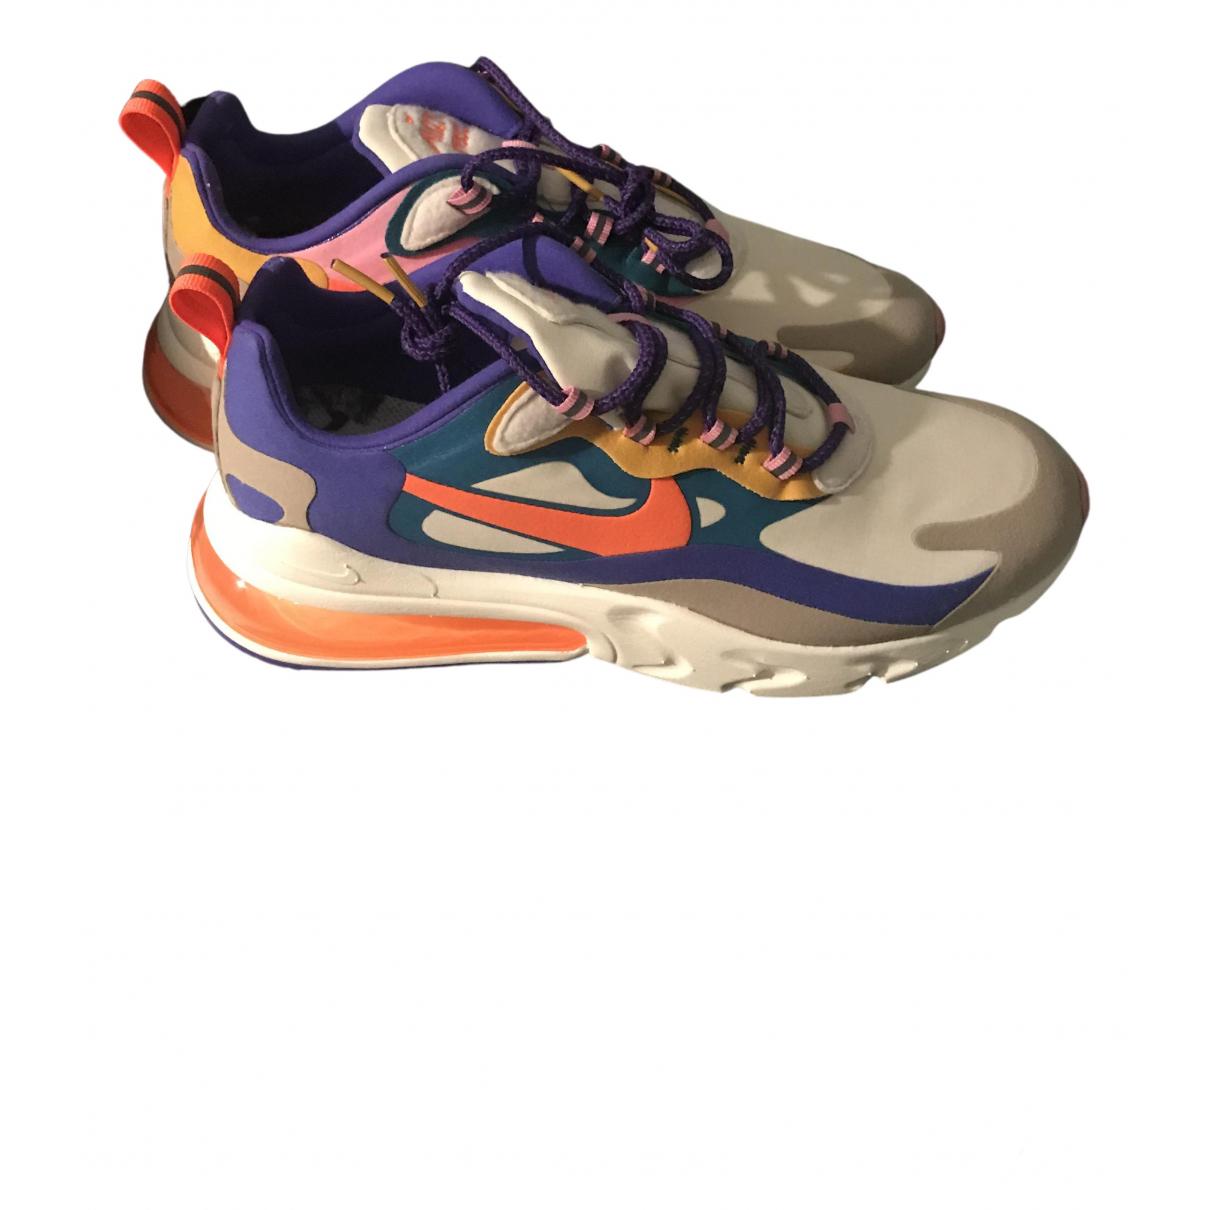 Nike Air Max 270  Sneakers in  Bunt Kautschuk